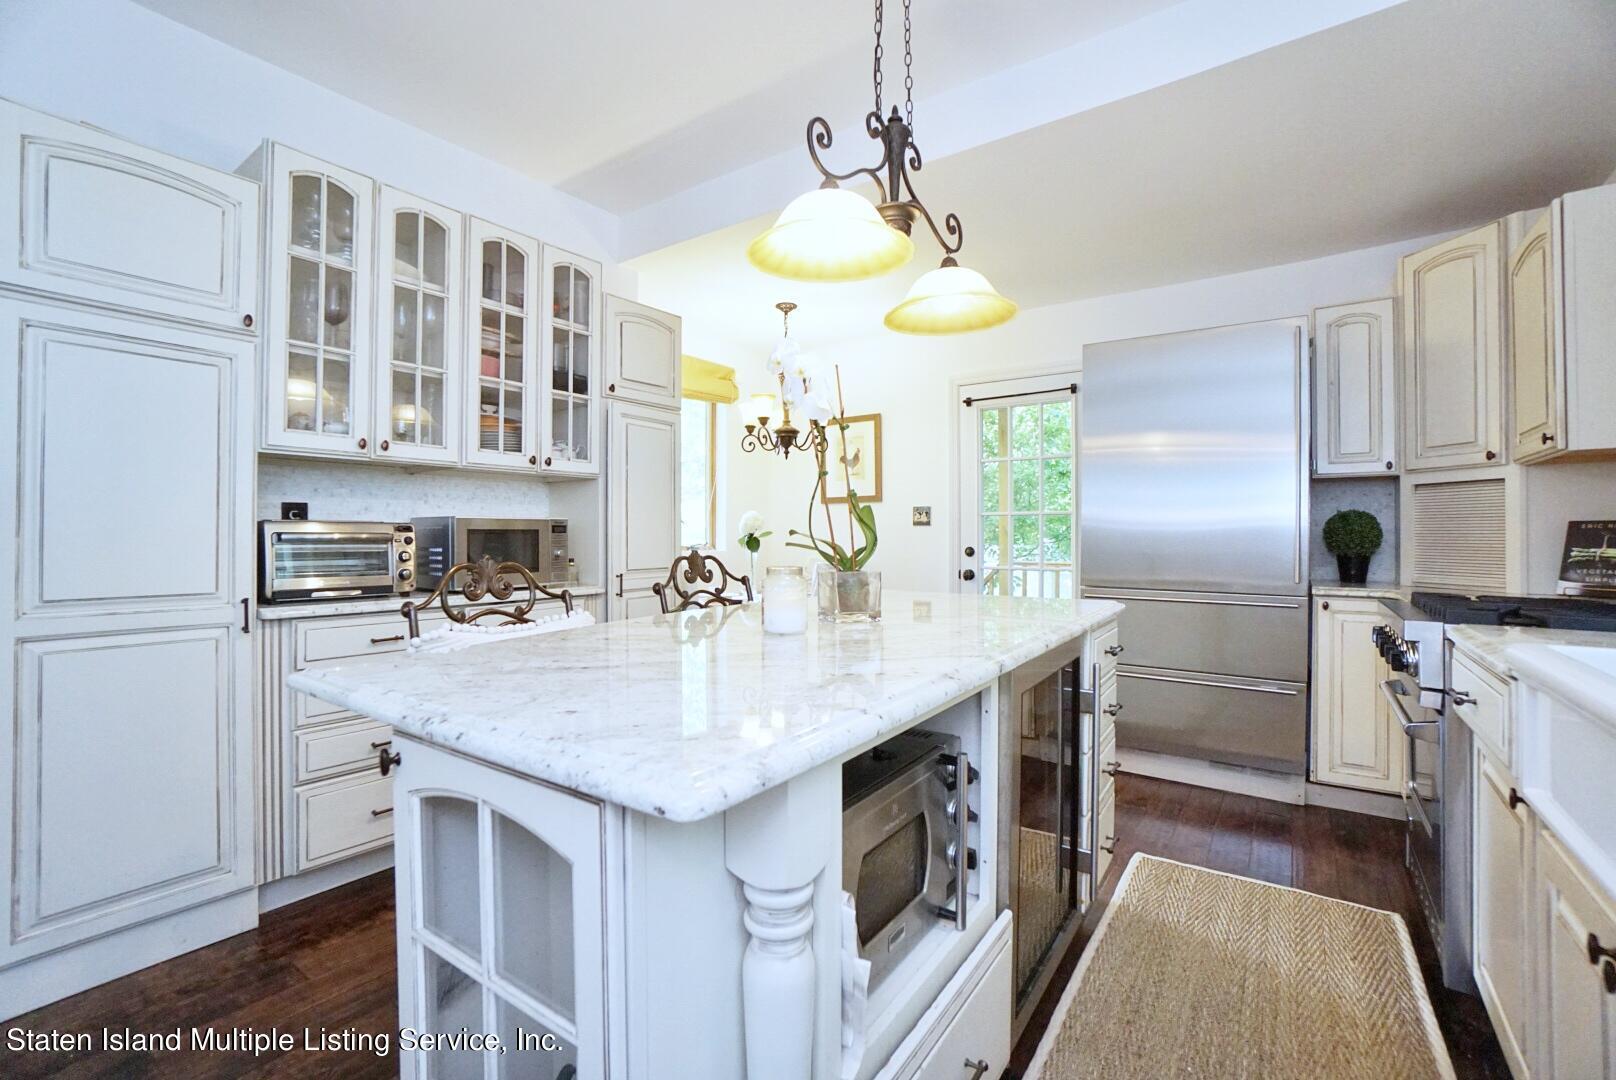 Single Family - Detached 311 Bement Avenue  Staten Island, NY 10310, MLS-1147133-15